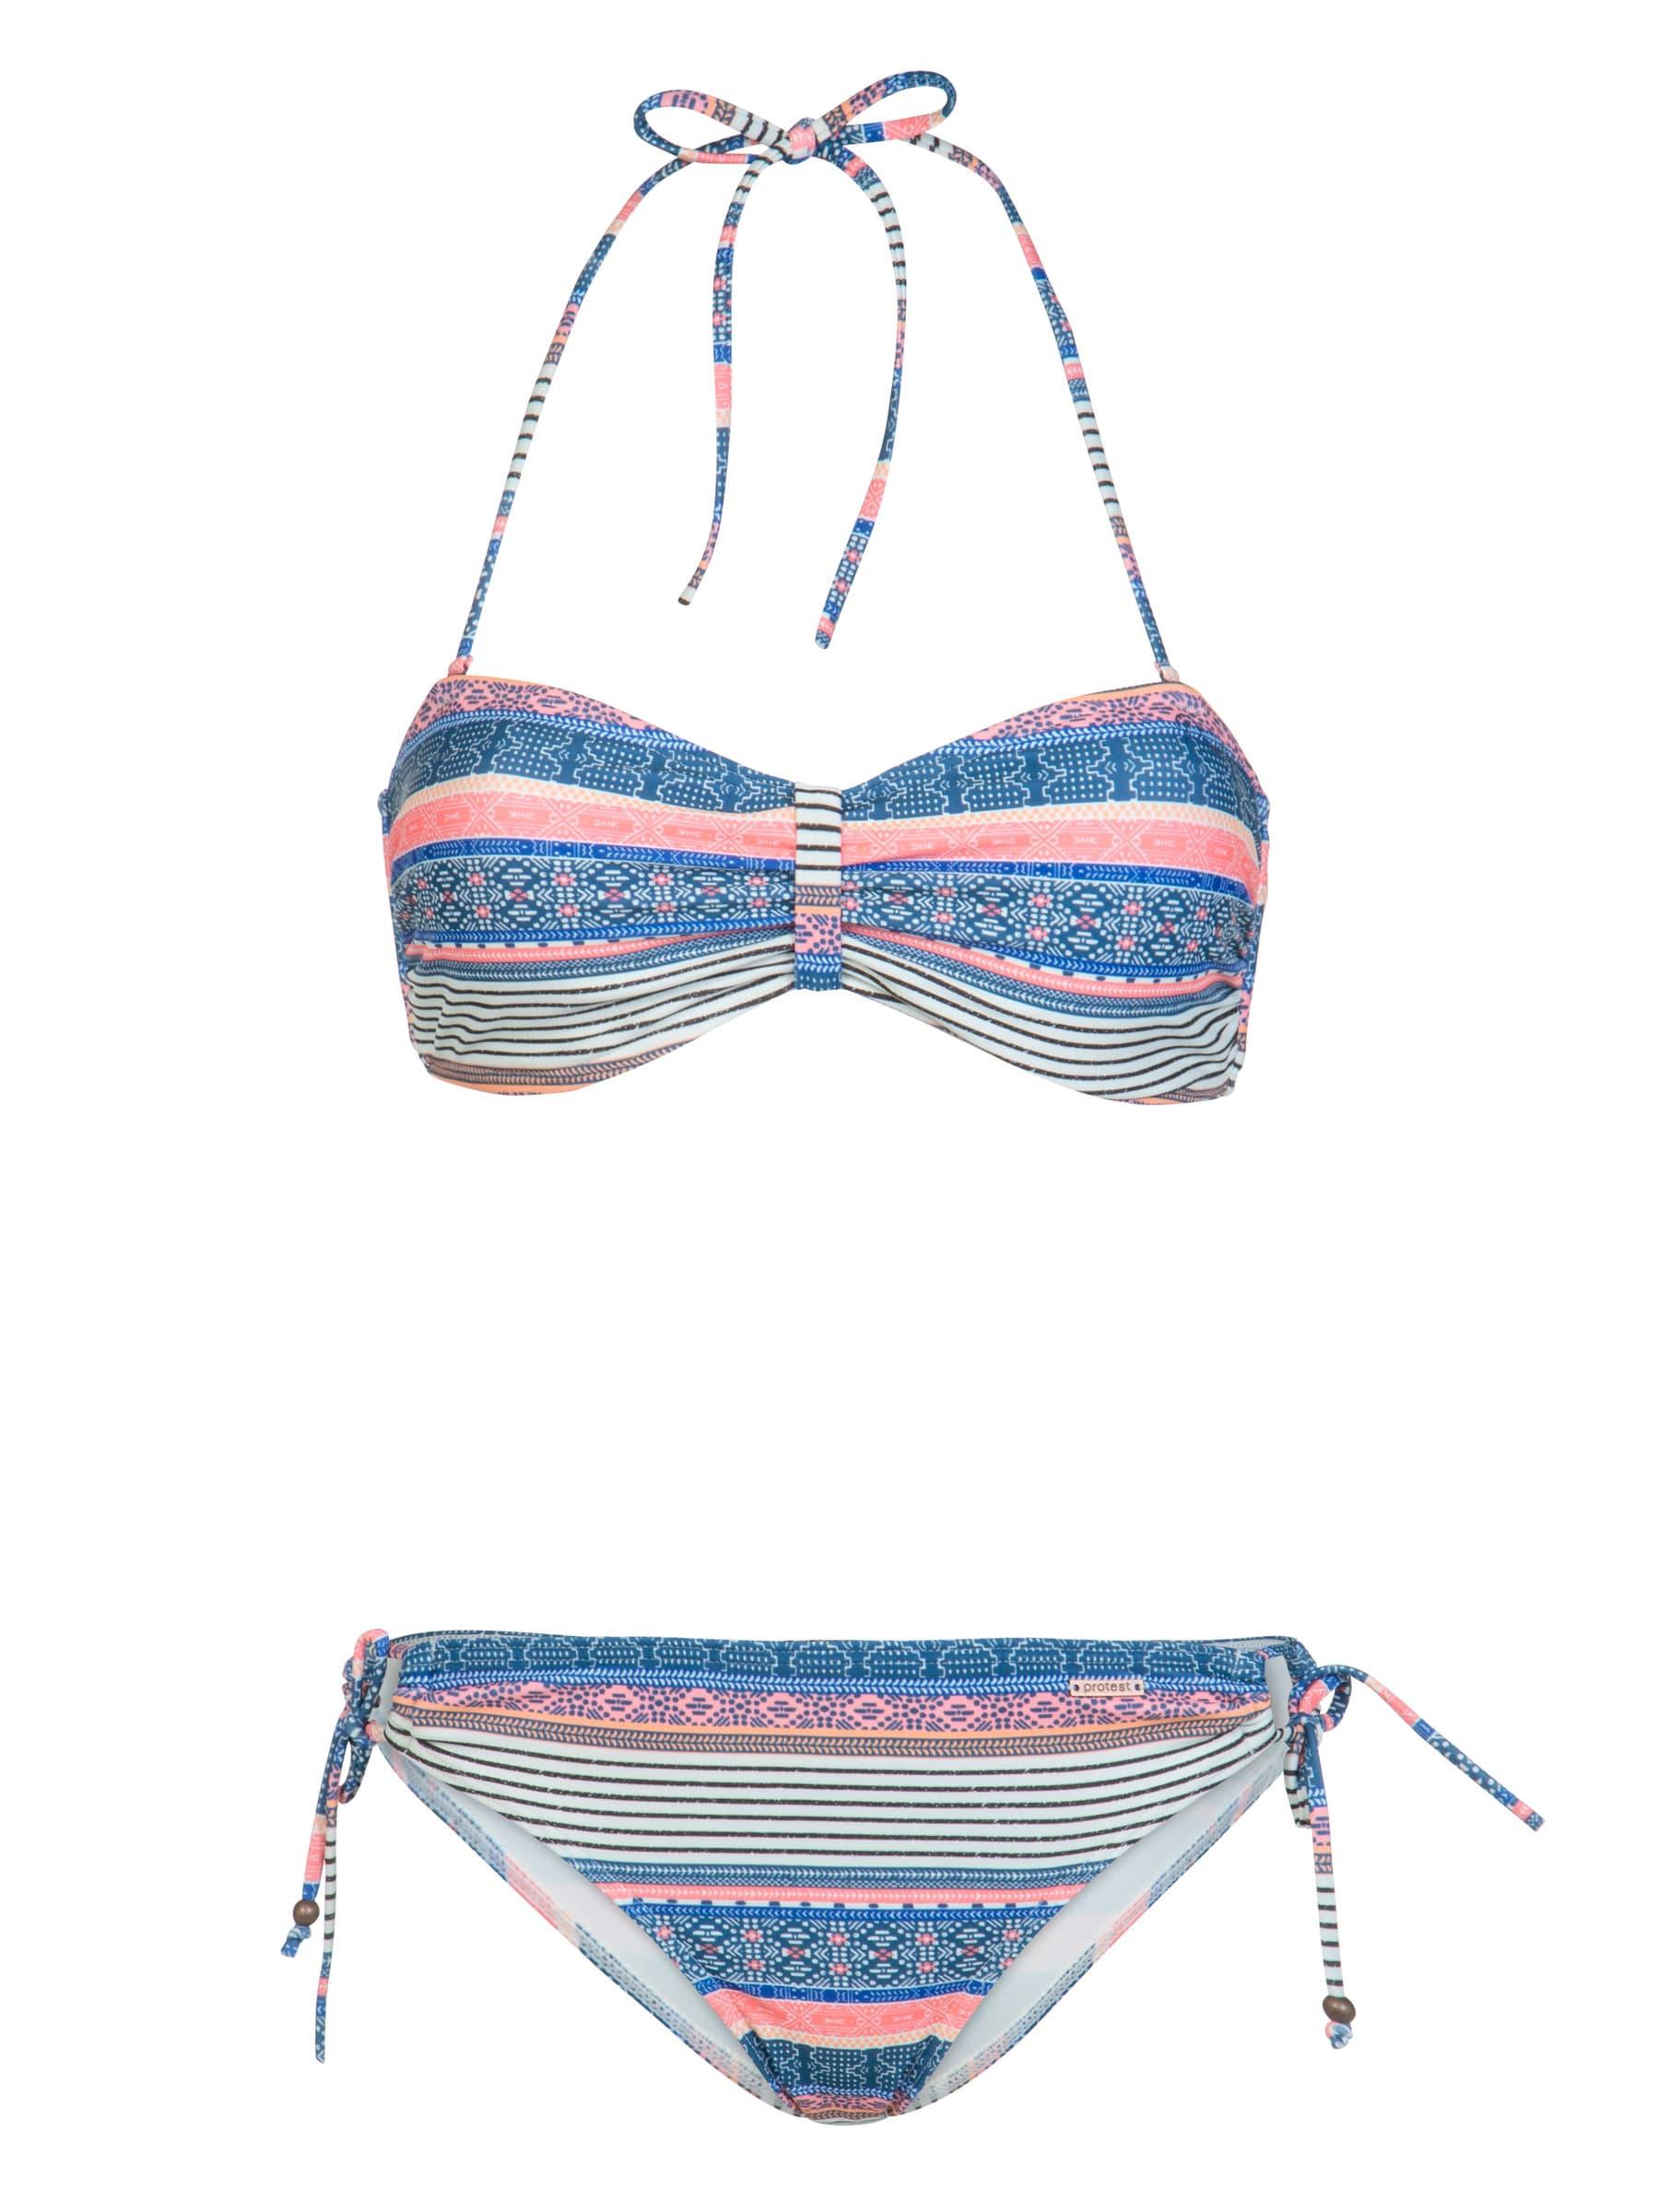 neue niedrigere Preise amazon Turnschuhe Protest BARBERA 19 bandeau Bikini Damen-Bikini | Migros